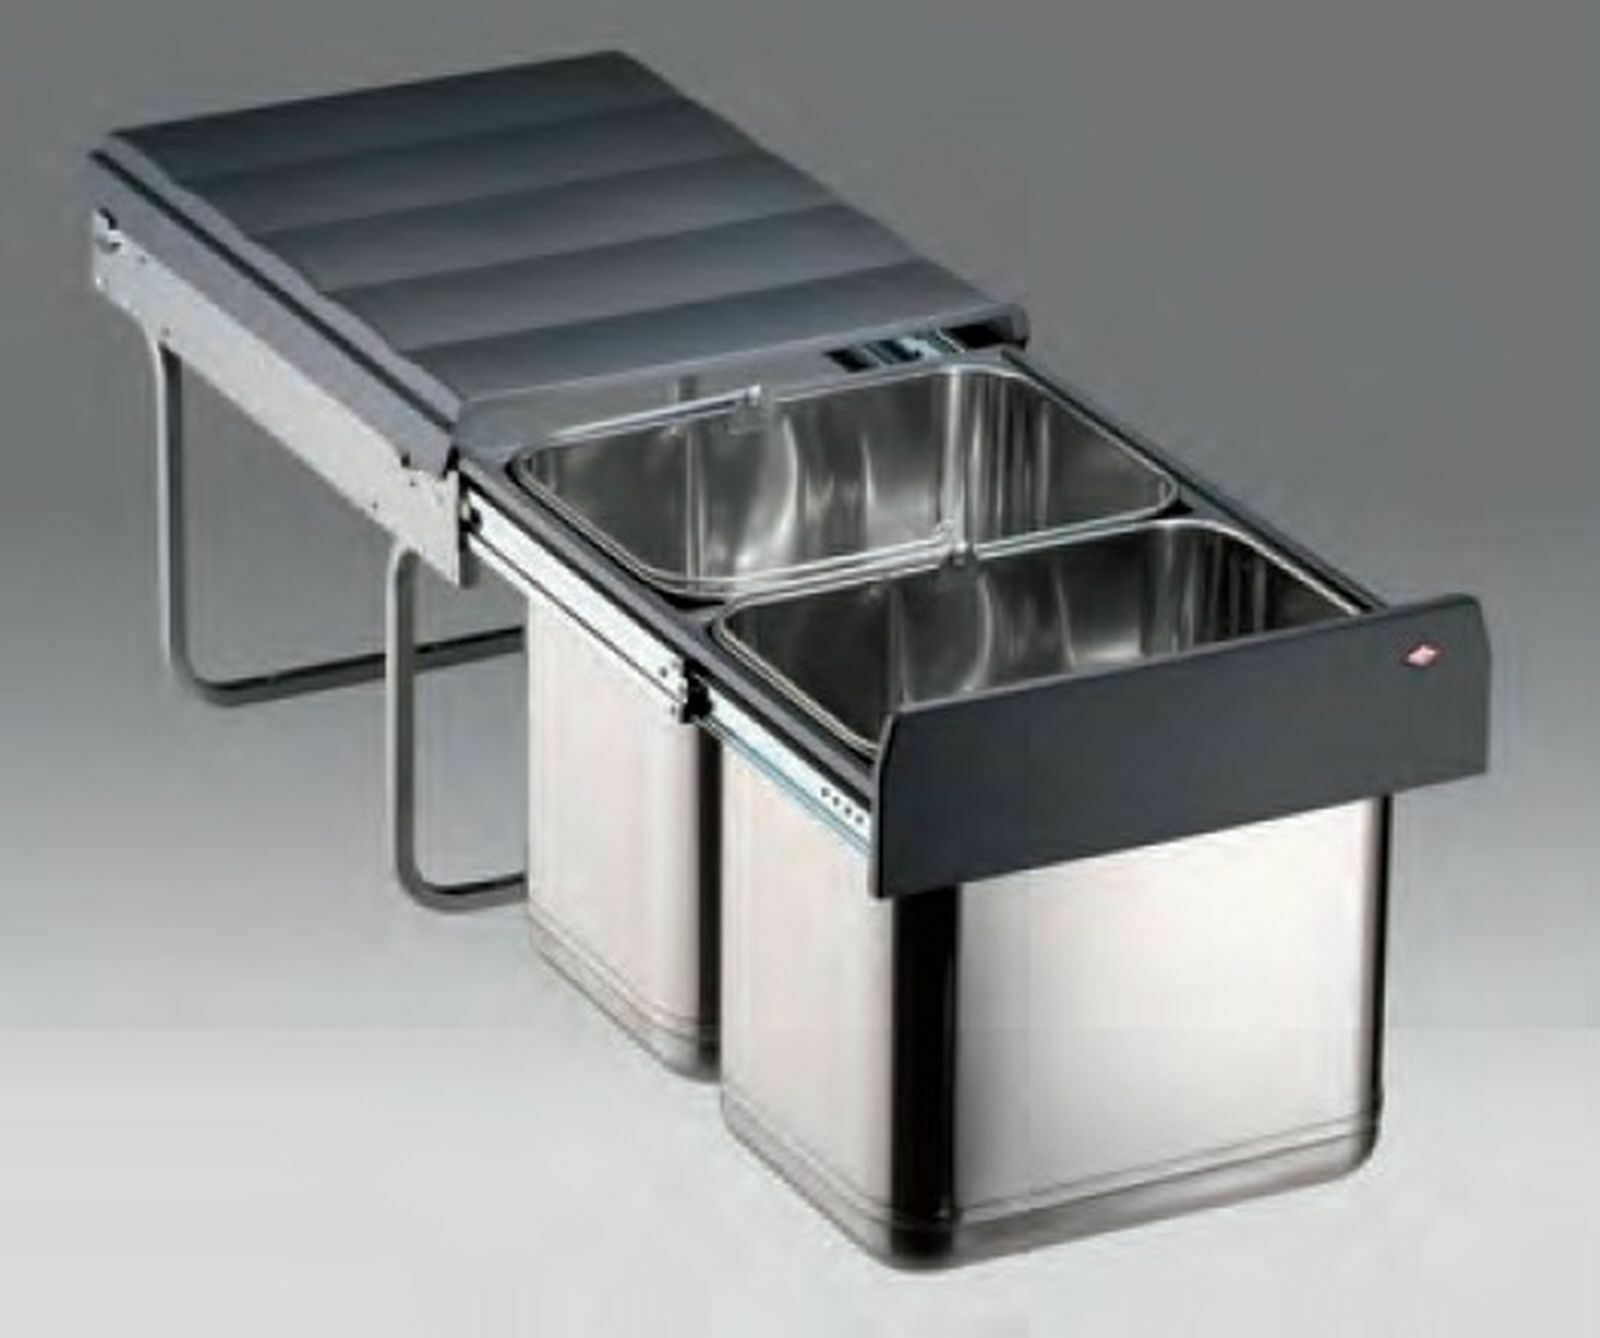 Full Size of Müllsystem 5e2706daa0039 Küche Wohnzimmer Müllsystem